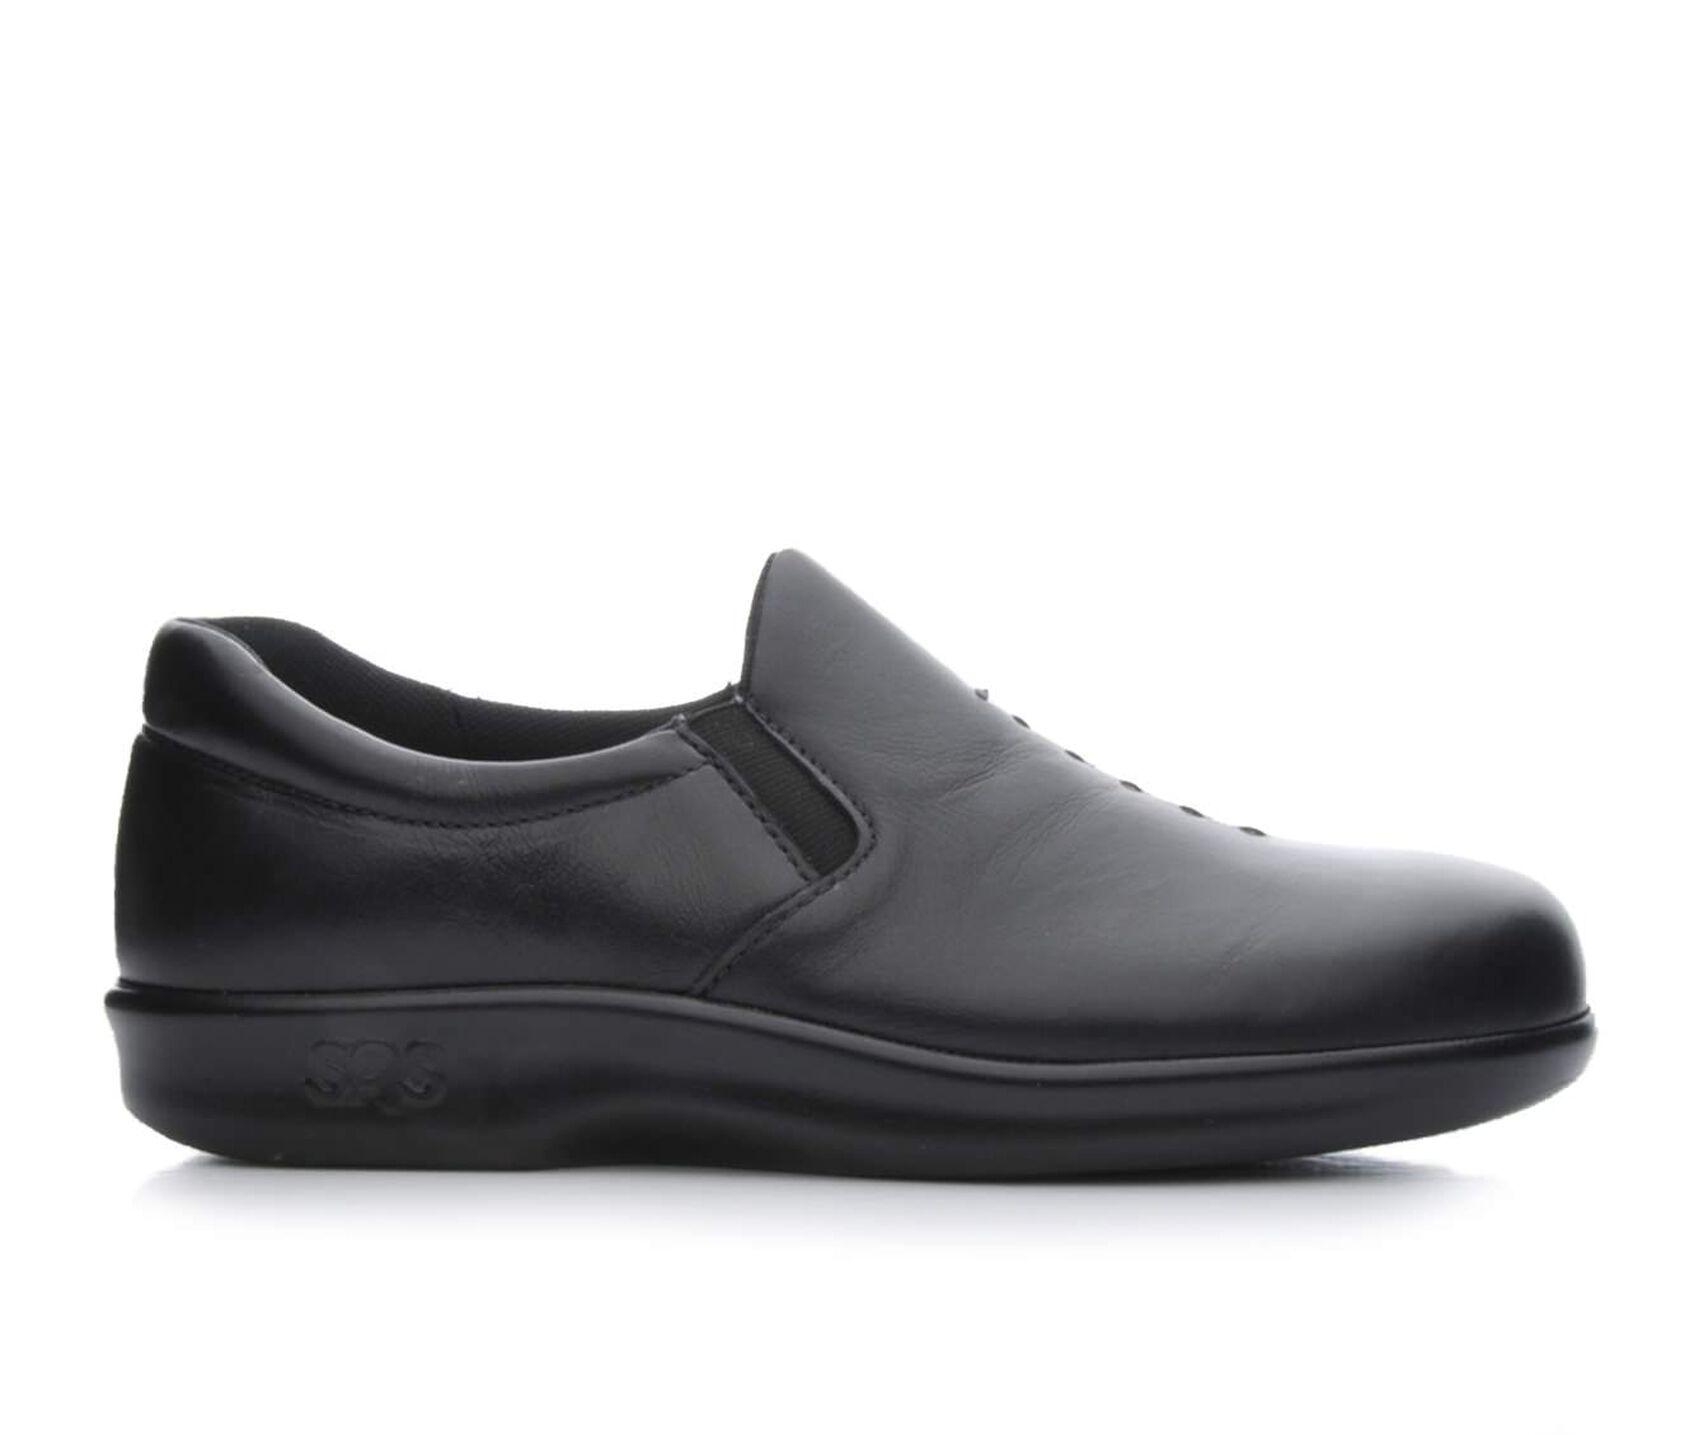 Sas Womens Black Shoes Size